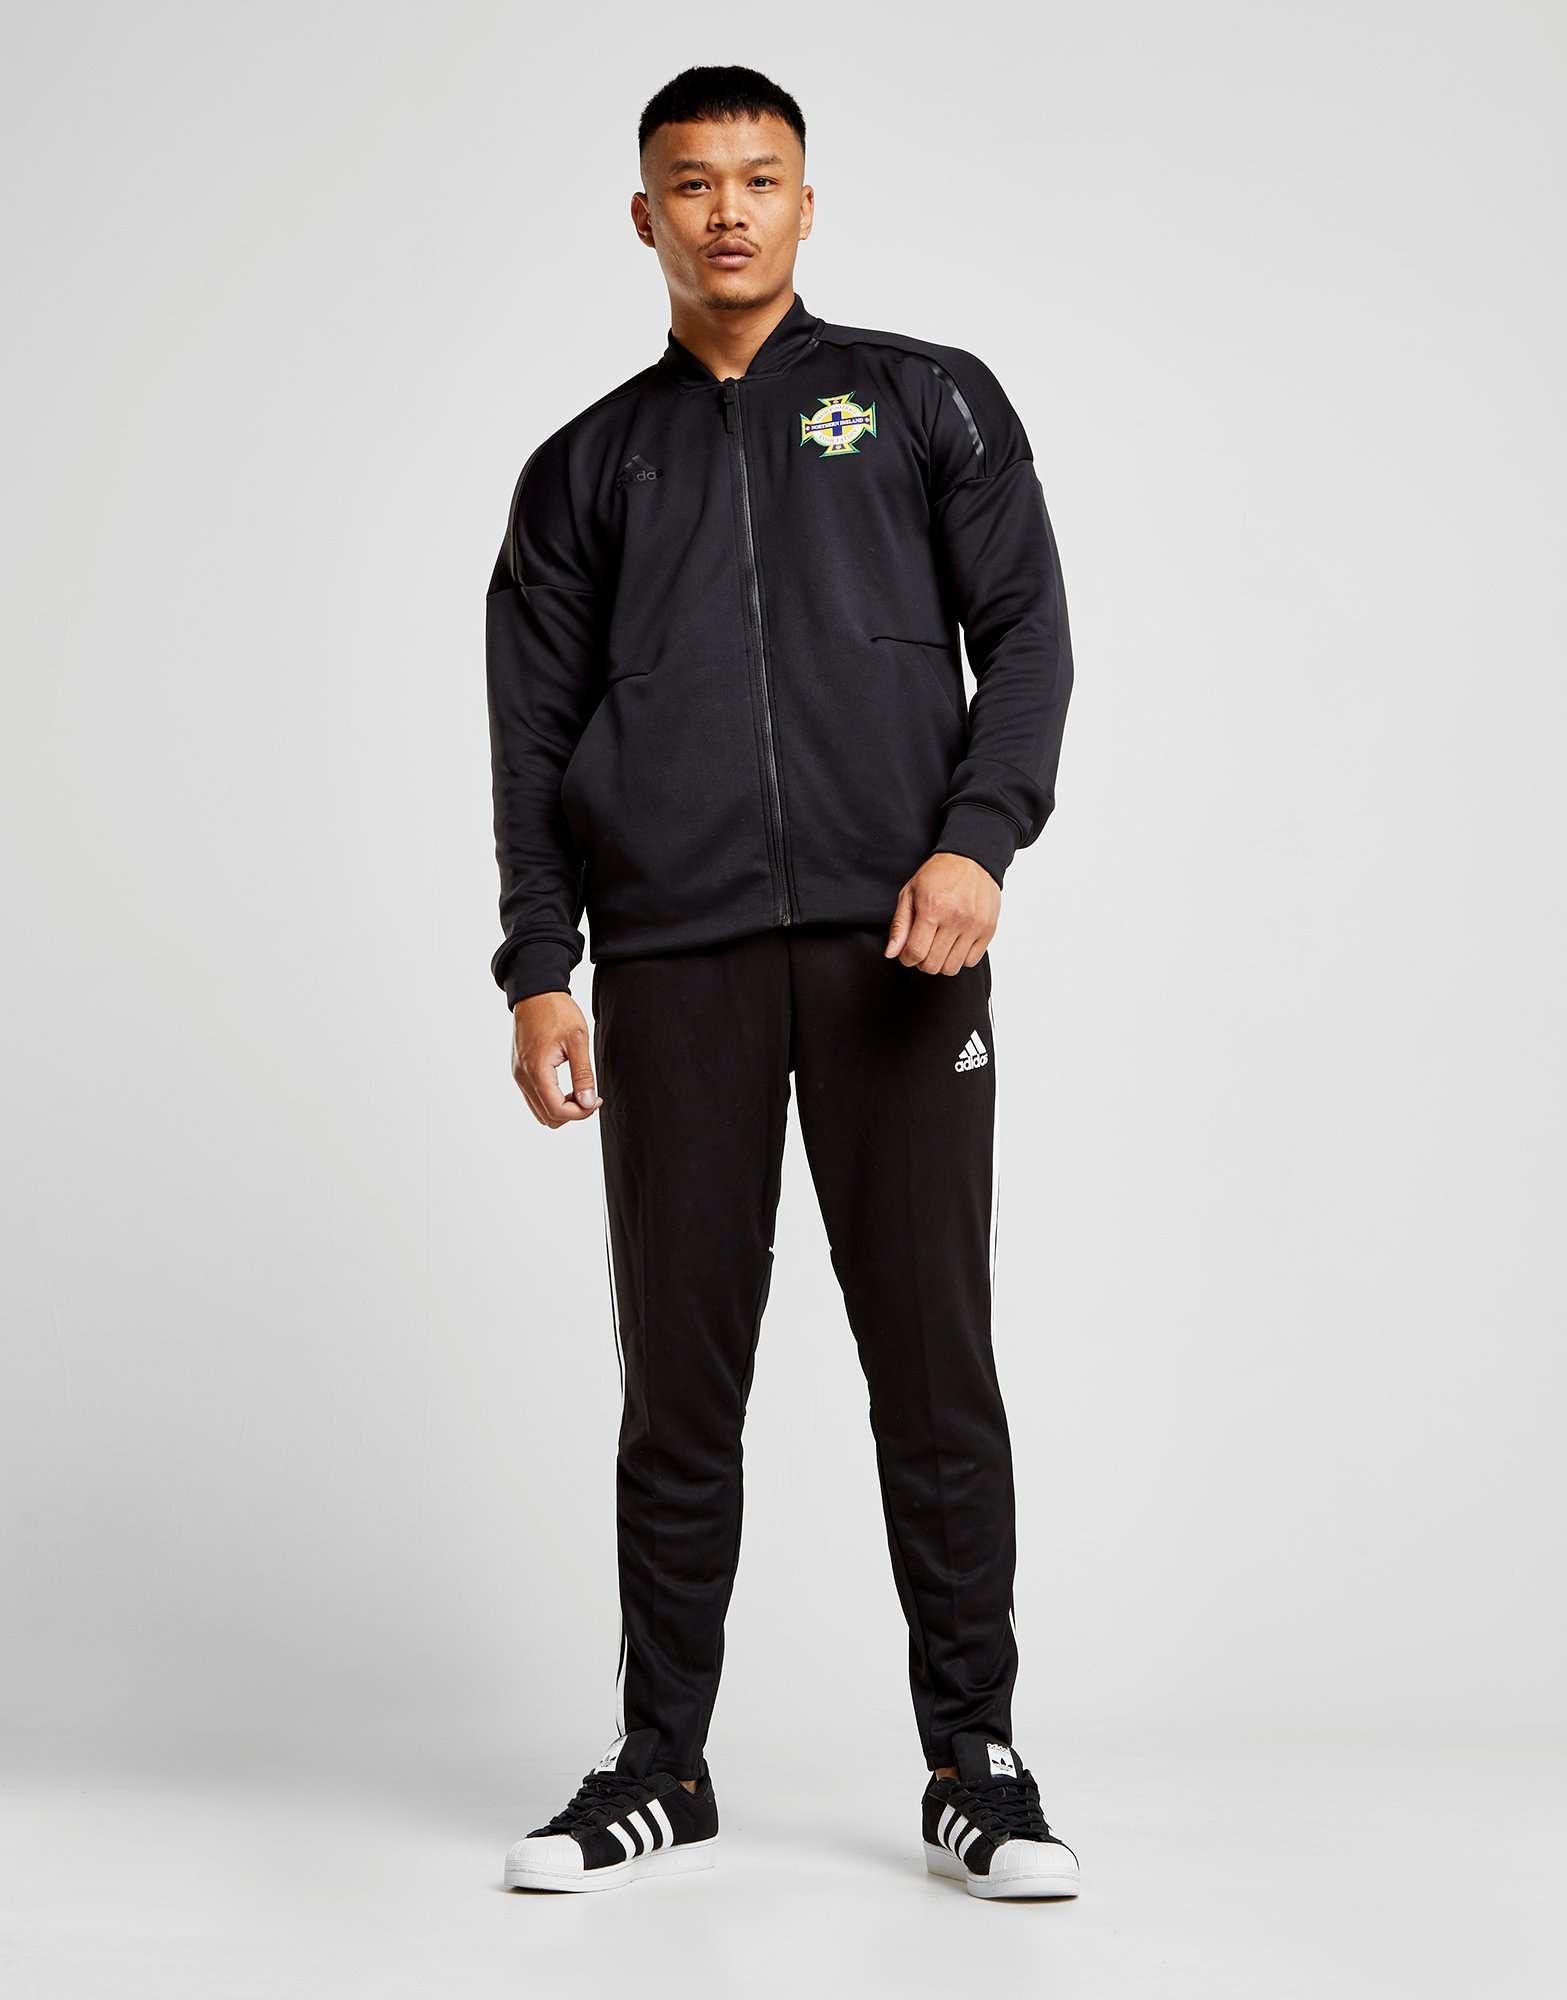 adidas Northern Ireland 2018/19 Anthem Jacket